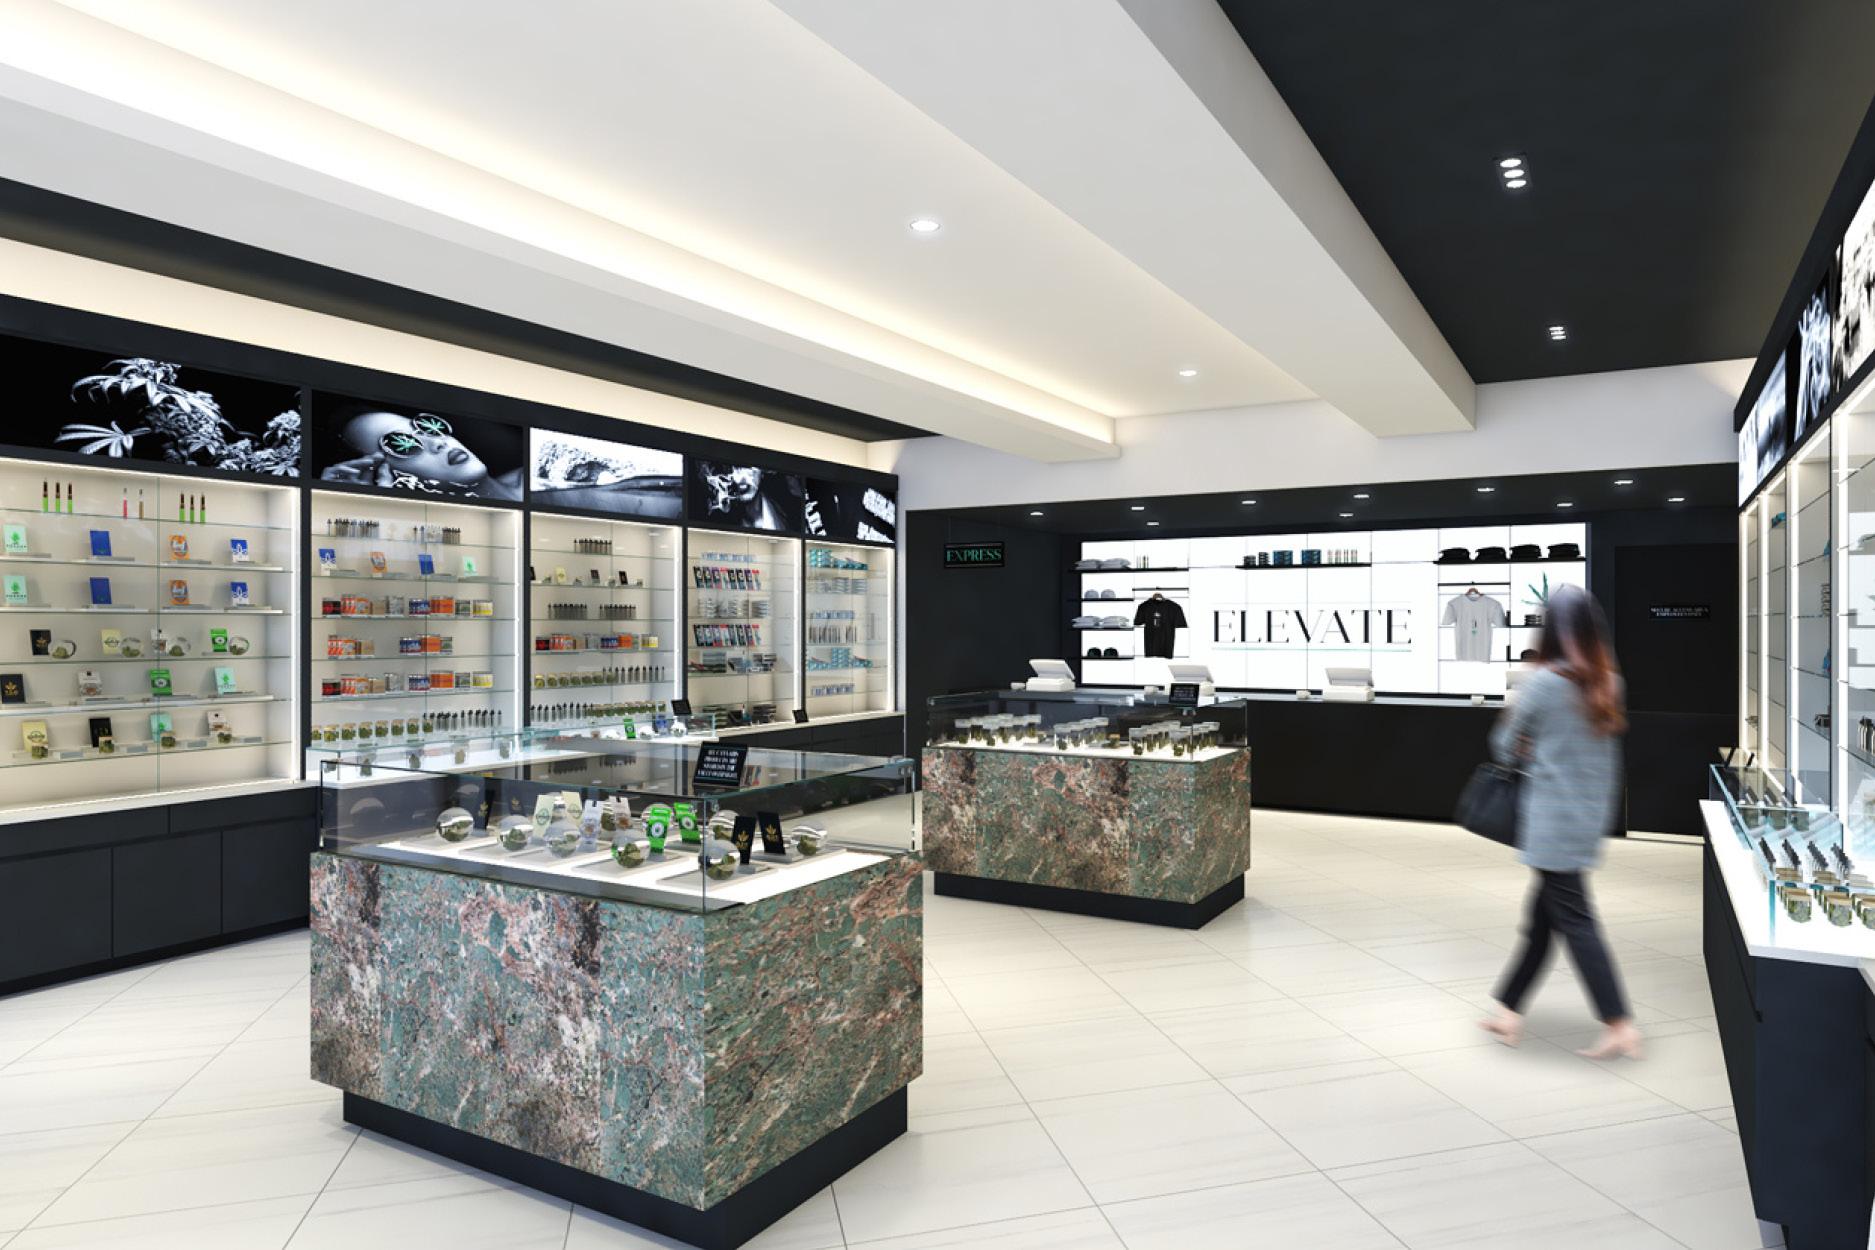 Elevate Dispensary in Vineyard, CA - Retail Interior Design by High Road Studio - Coming Soon